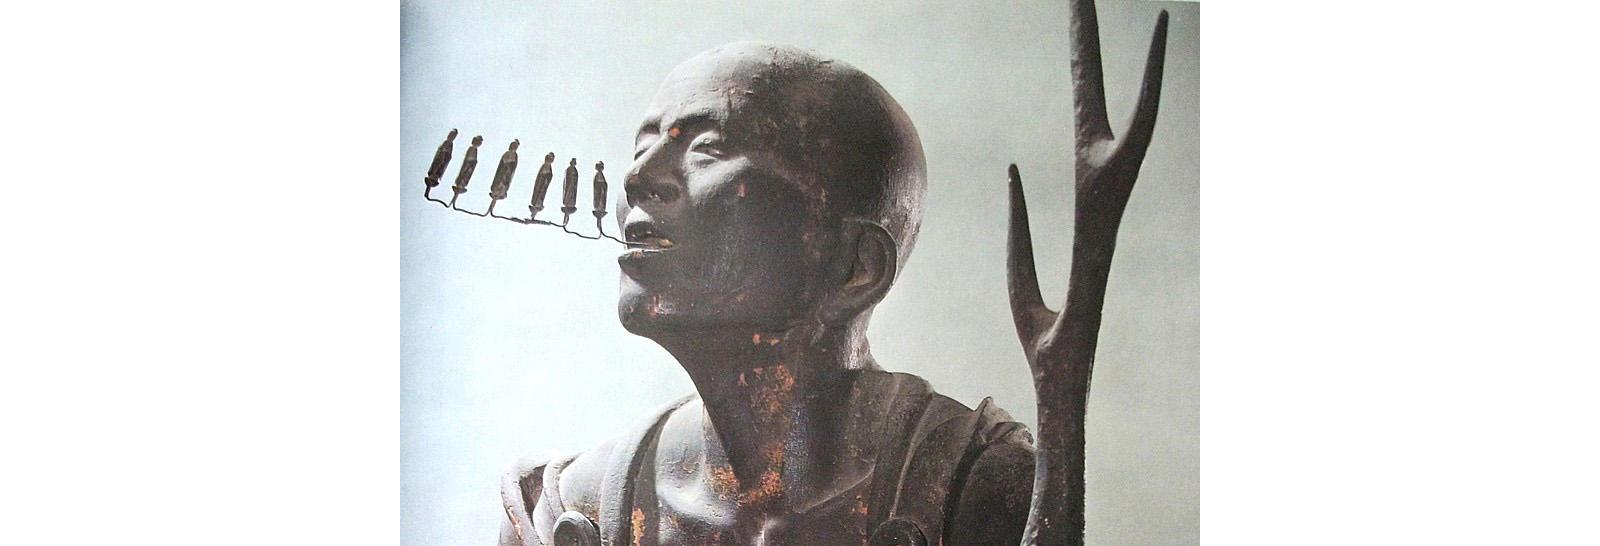 Buddhist singing statue